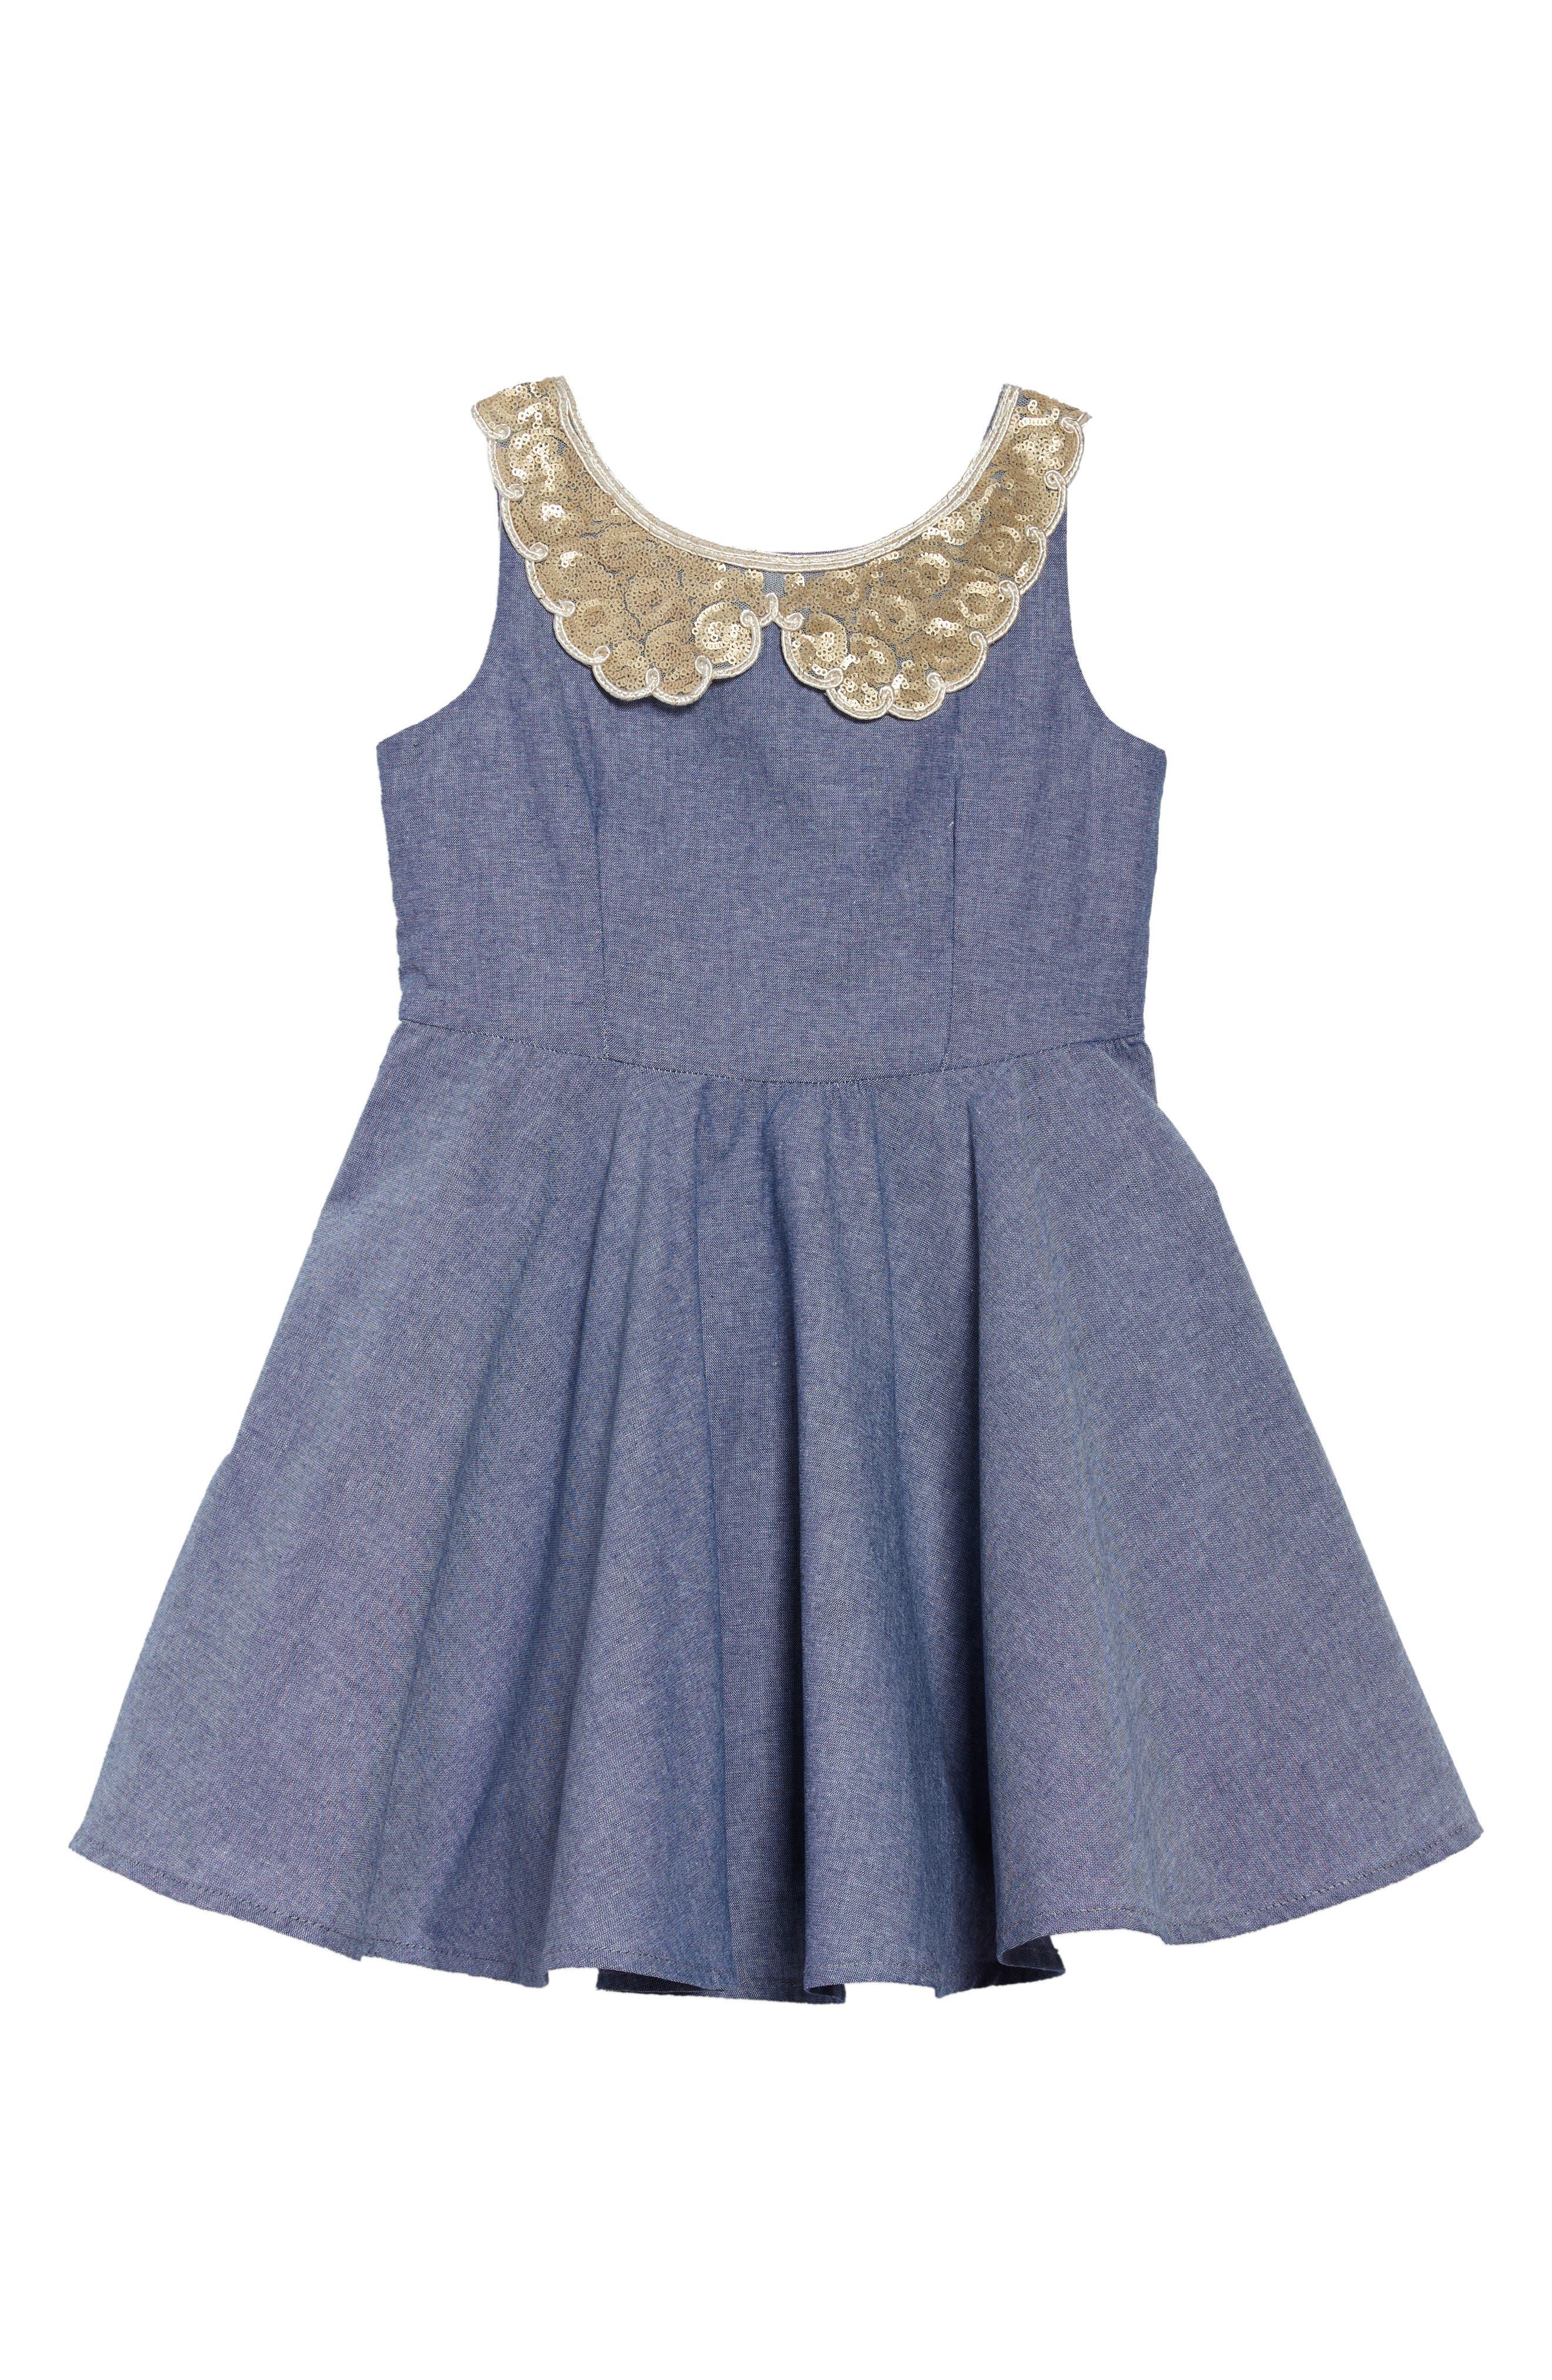 Main Image - Fiveloaves Twofish Darcy Chambray Dress (Toddler Girls, Little Girls & Big Girls)